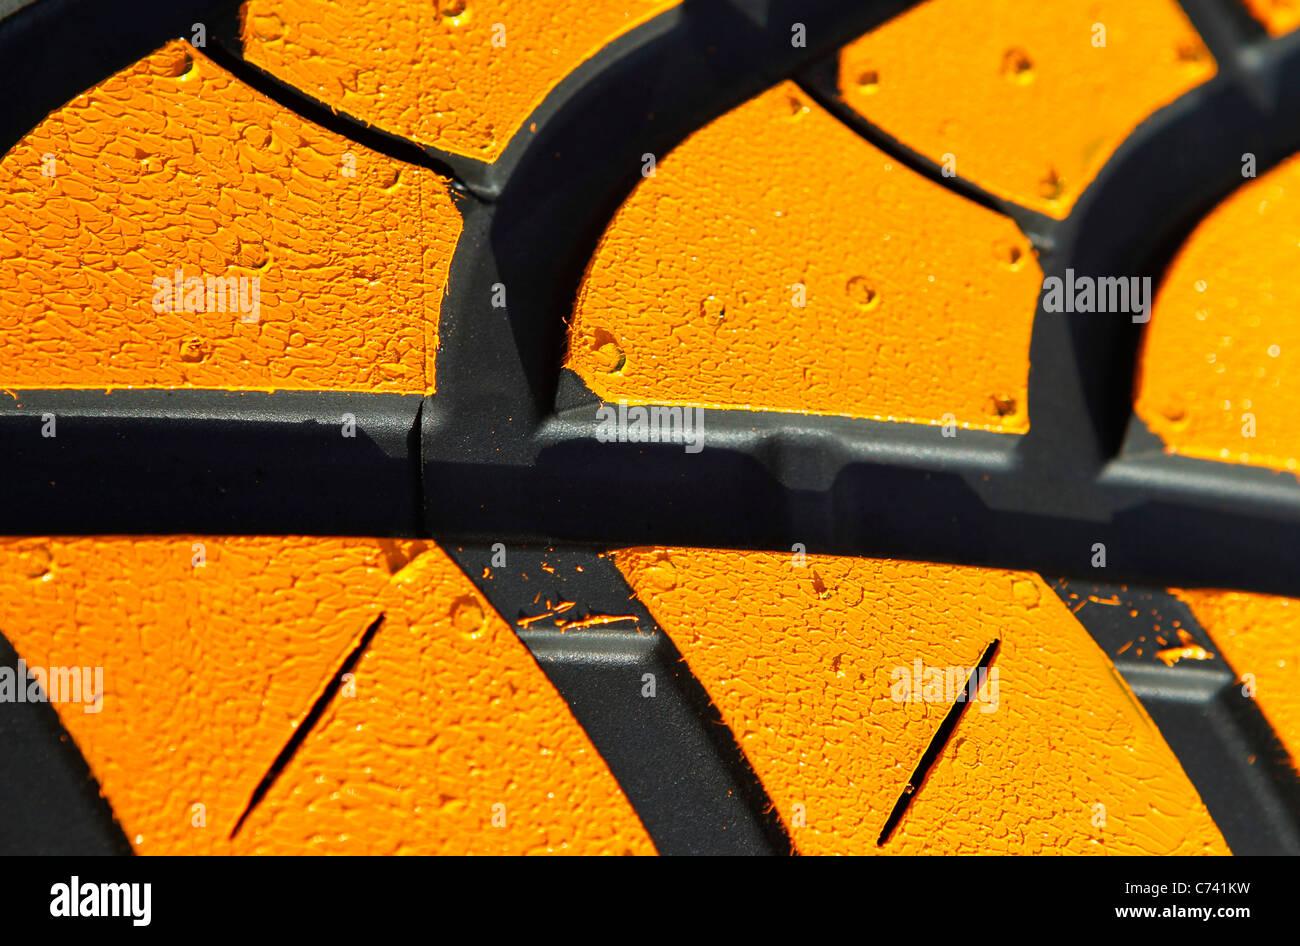 FIA Formula One World Championship Monza Italy 2011, F1 - Stock Image